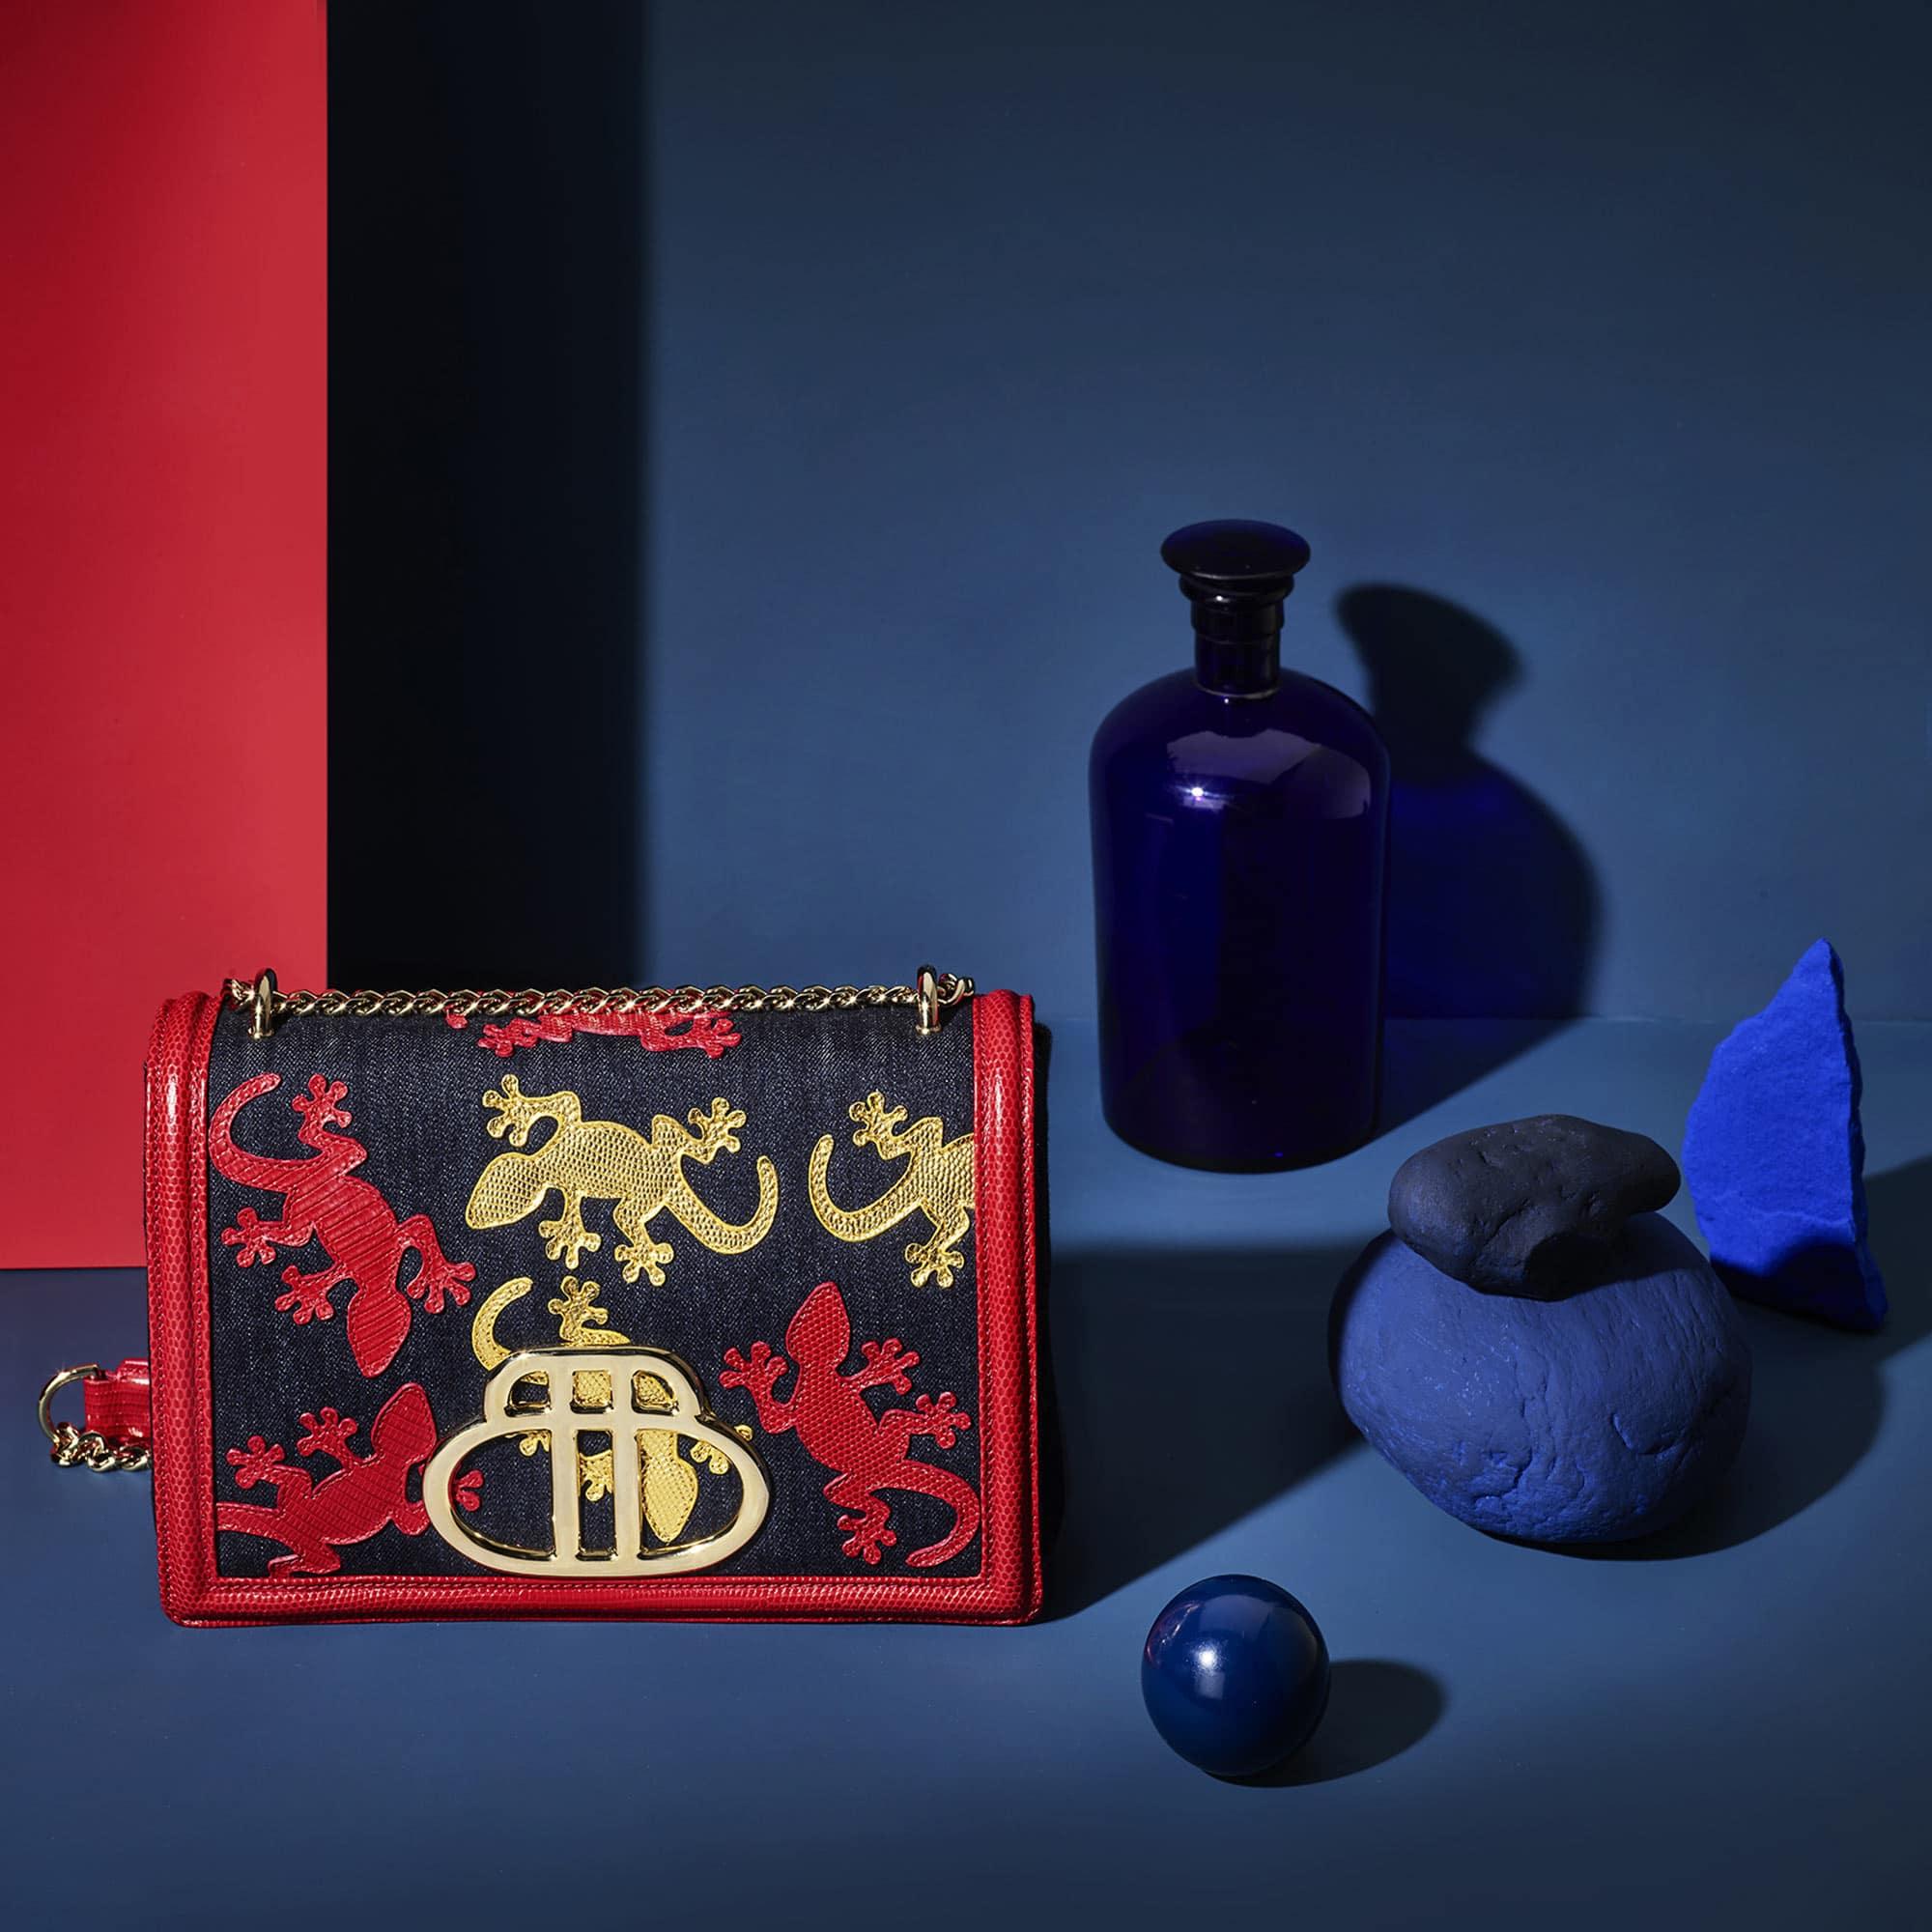 Geko Bag Red Blue Still Life Shot for Barchi by Fotografando